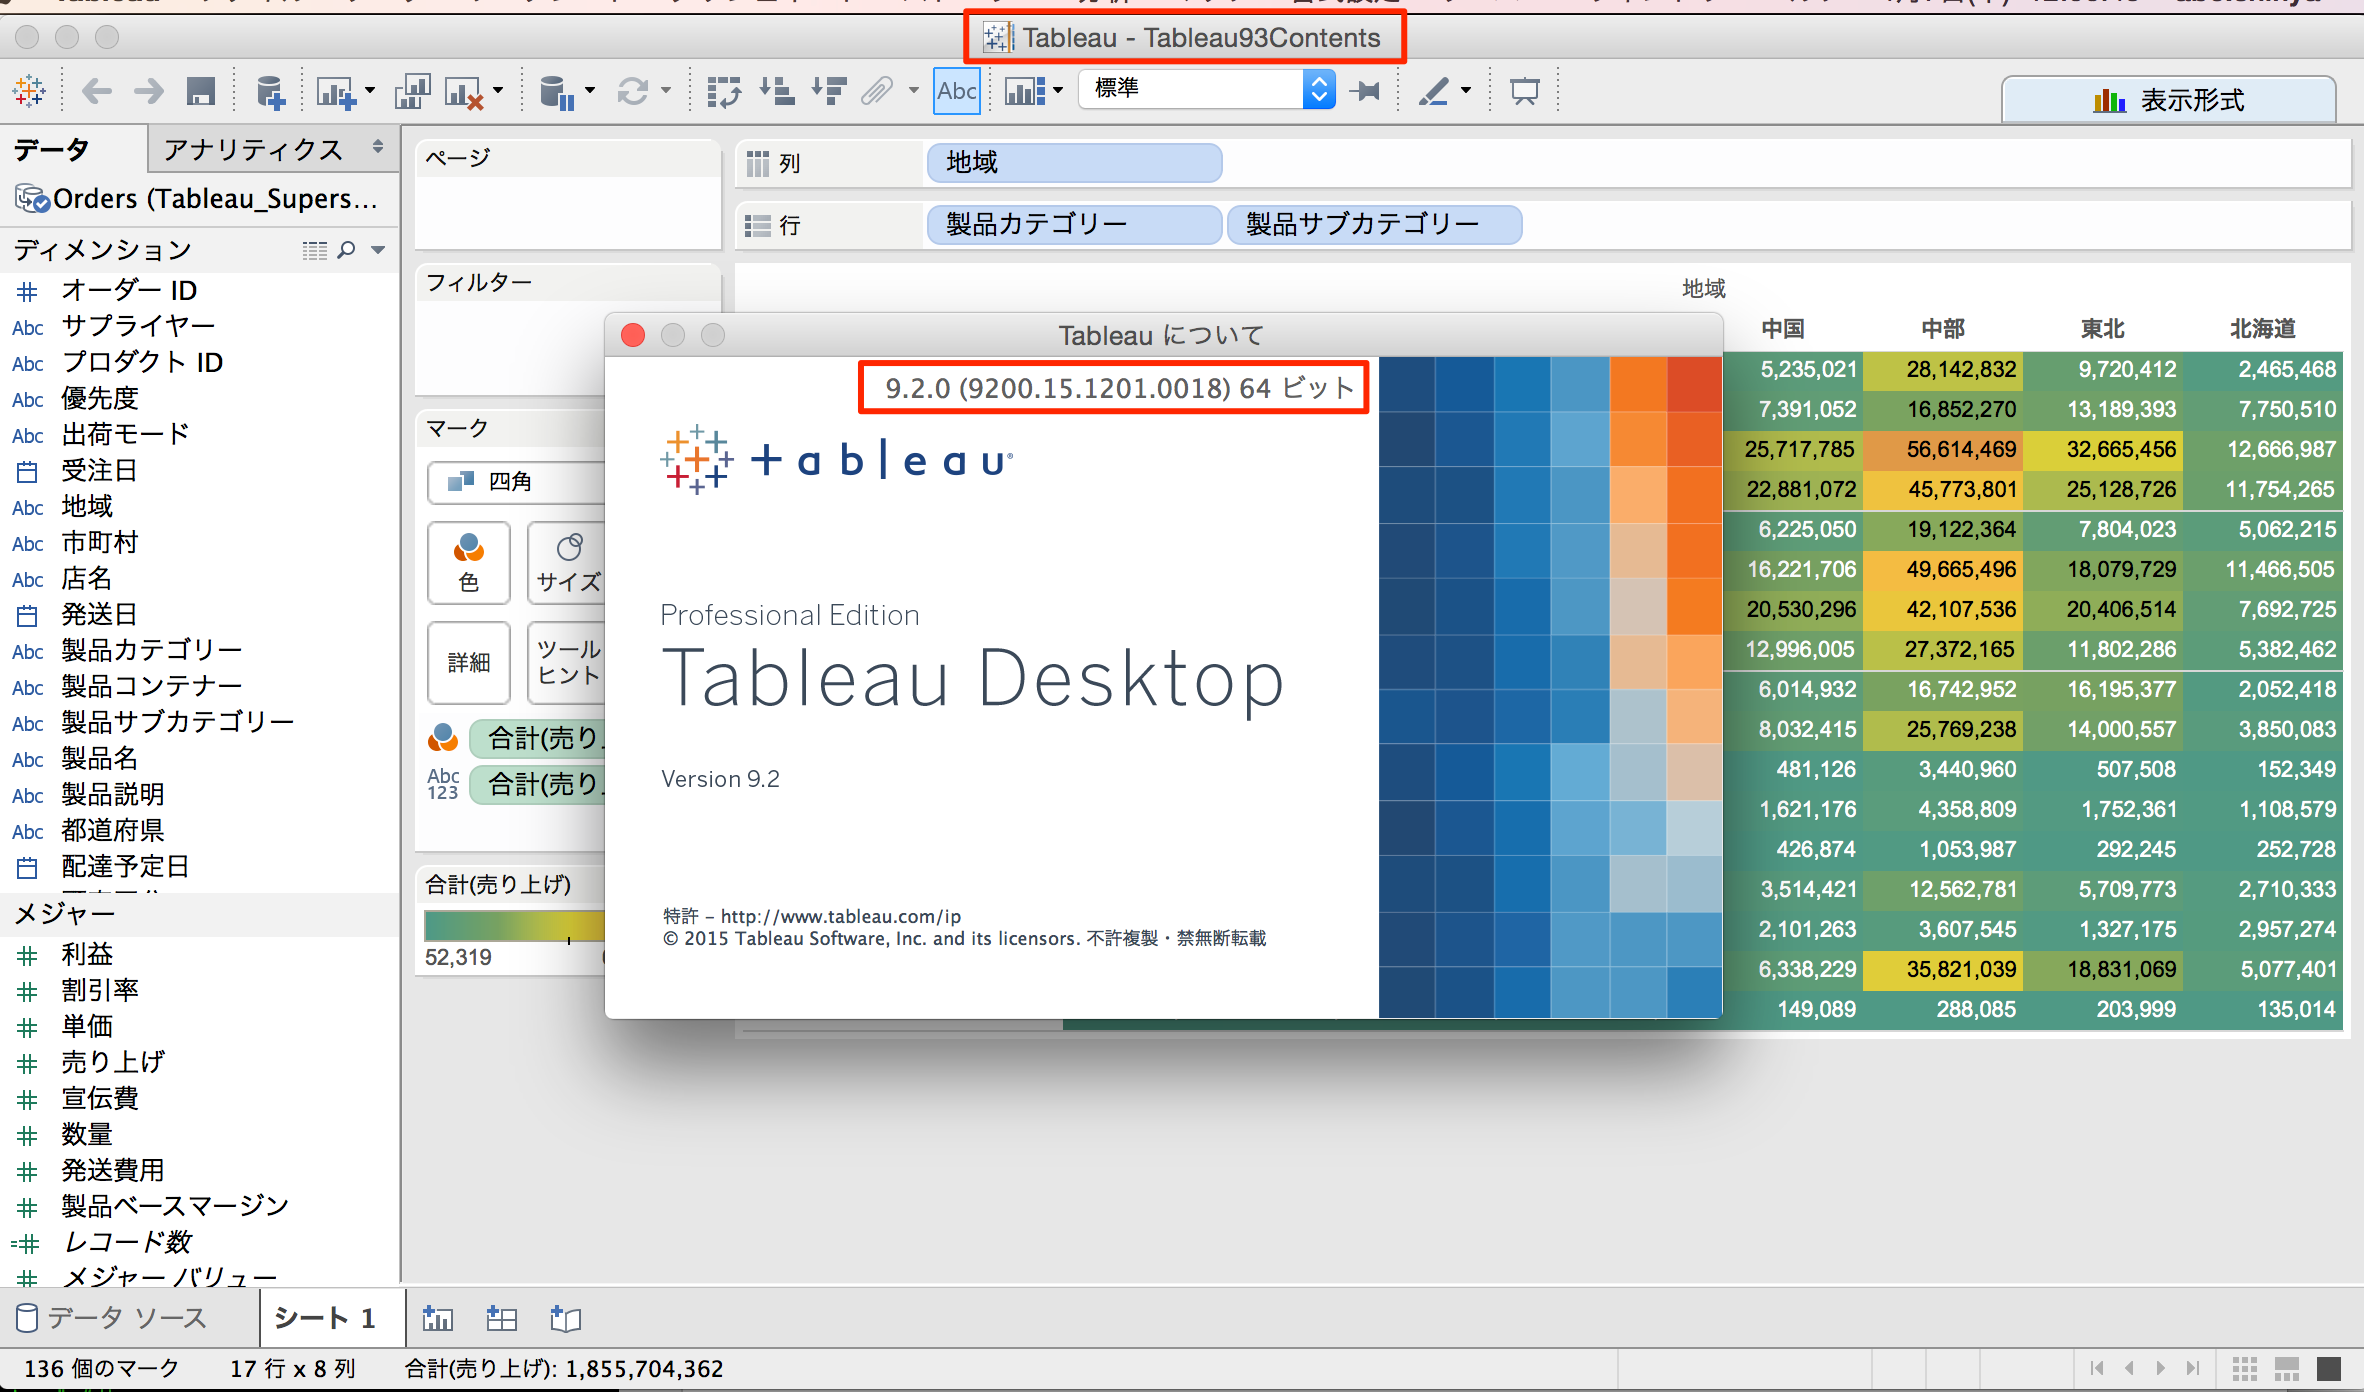 tableau-open-diff-version-workbook_2